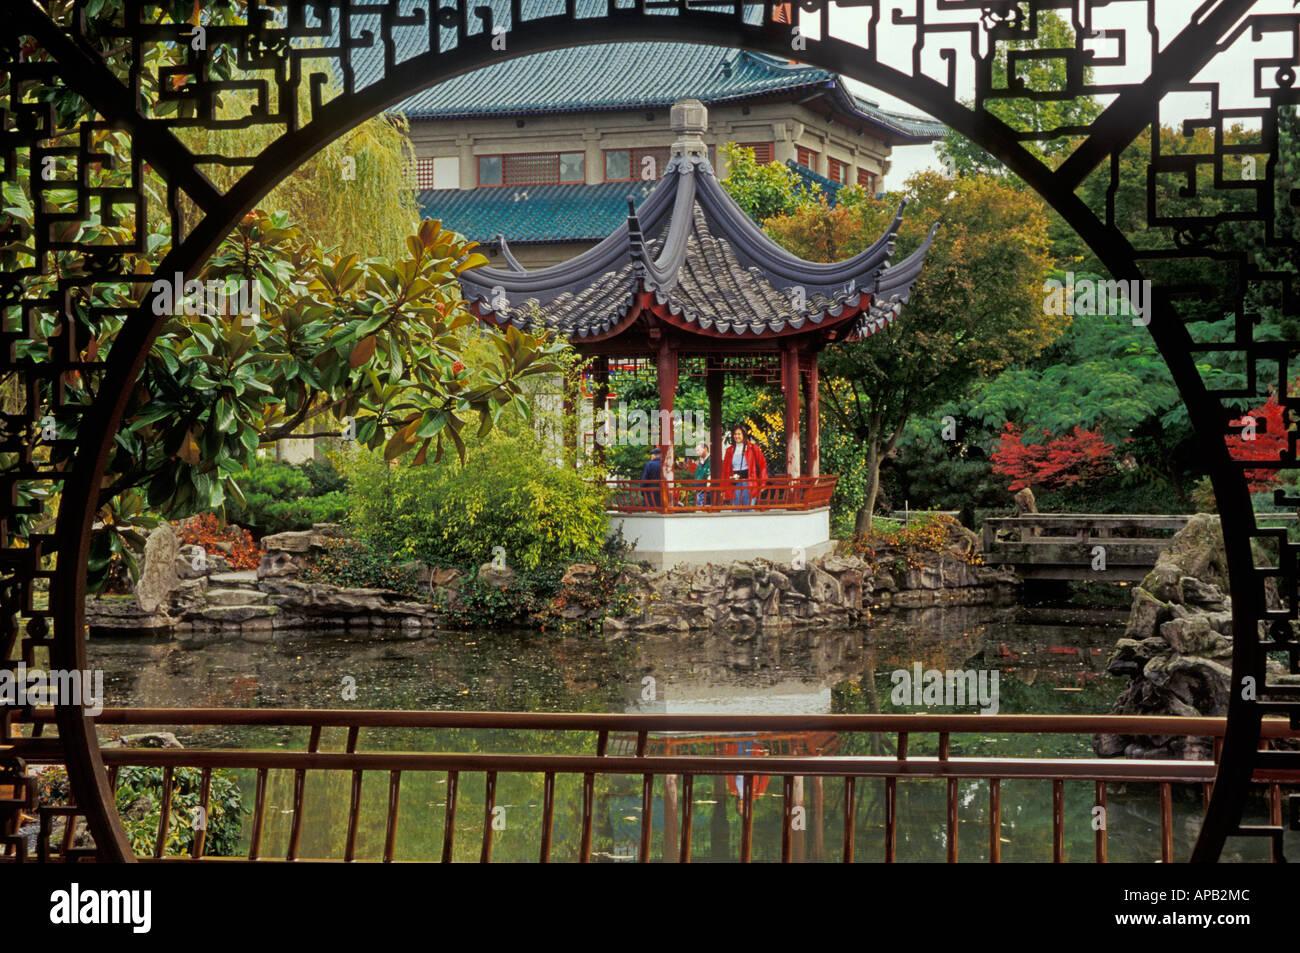 Doctor Sun Yat Sen Classical Chinese Garden Stock Photos & Doctor ...